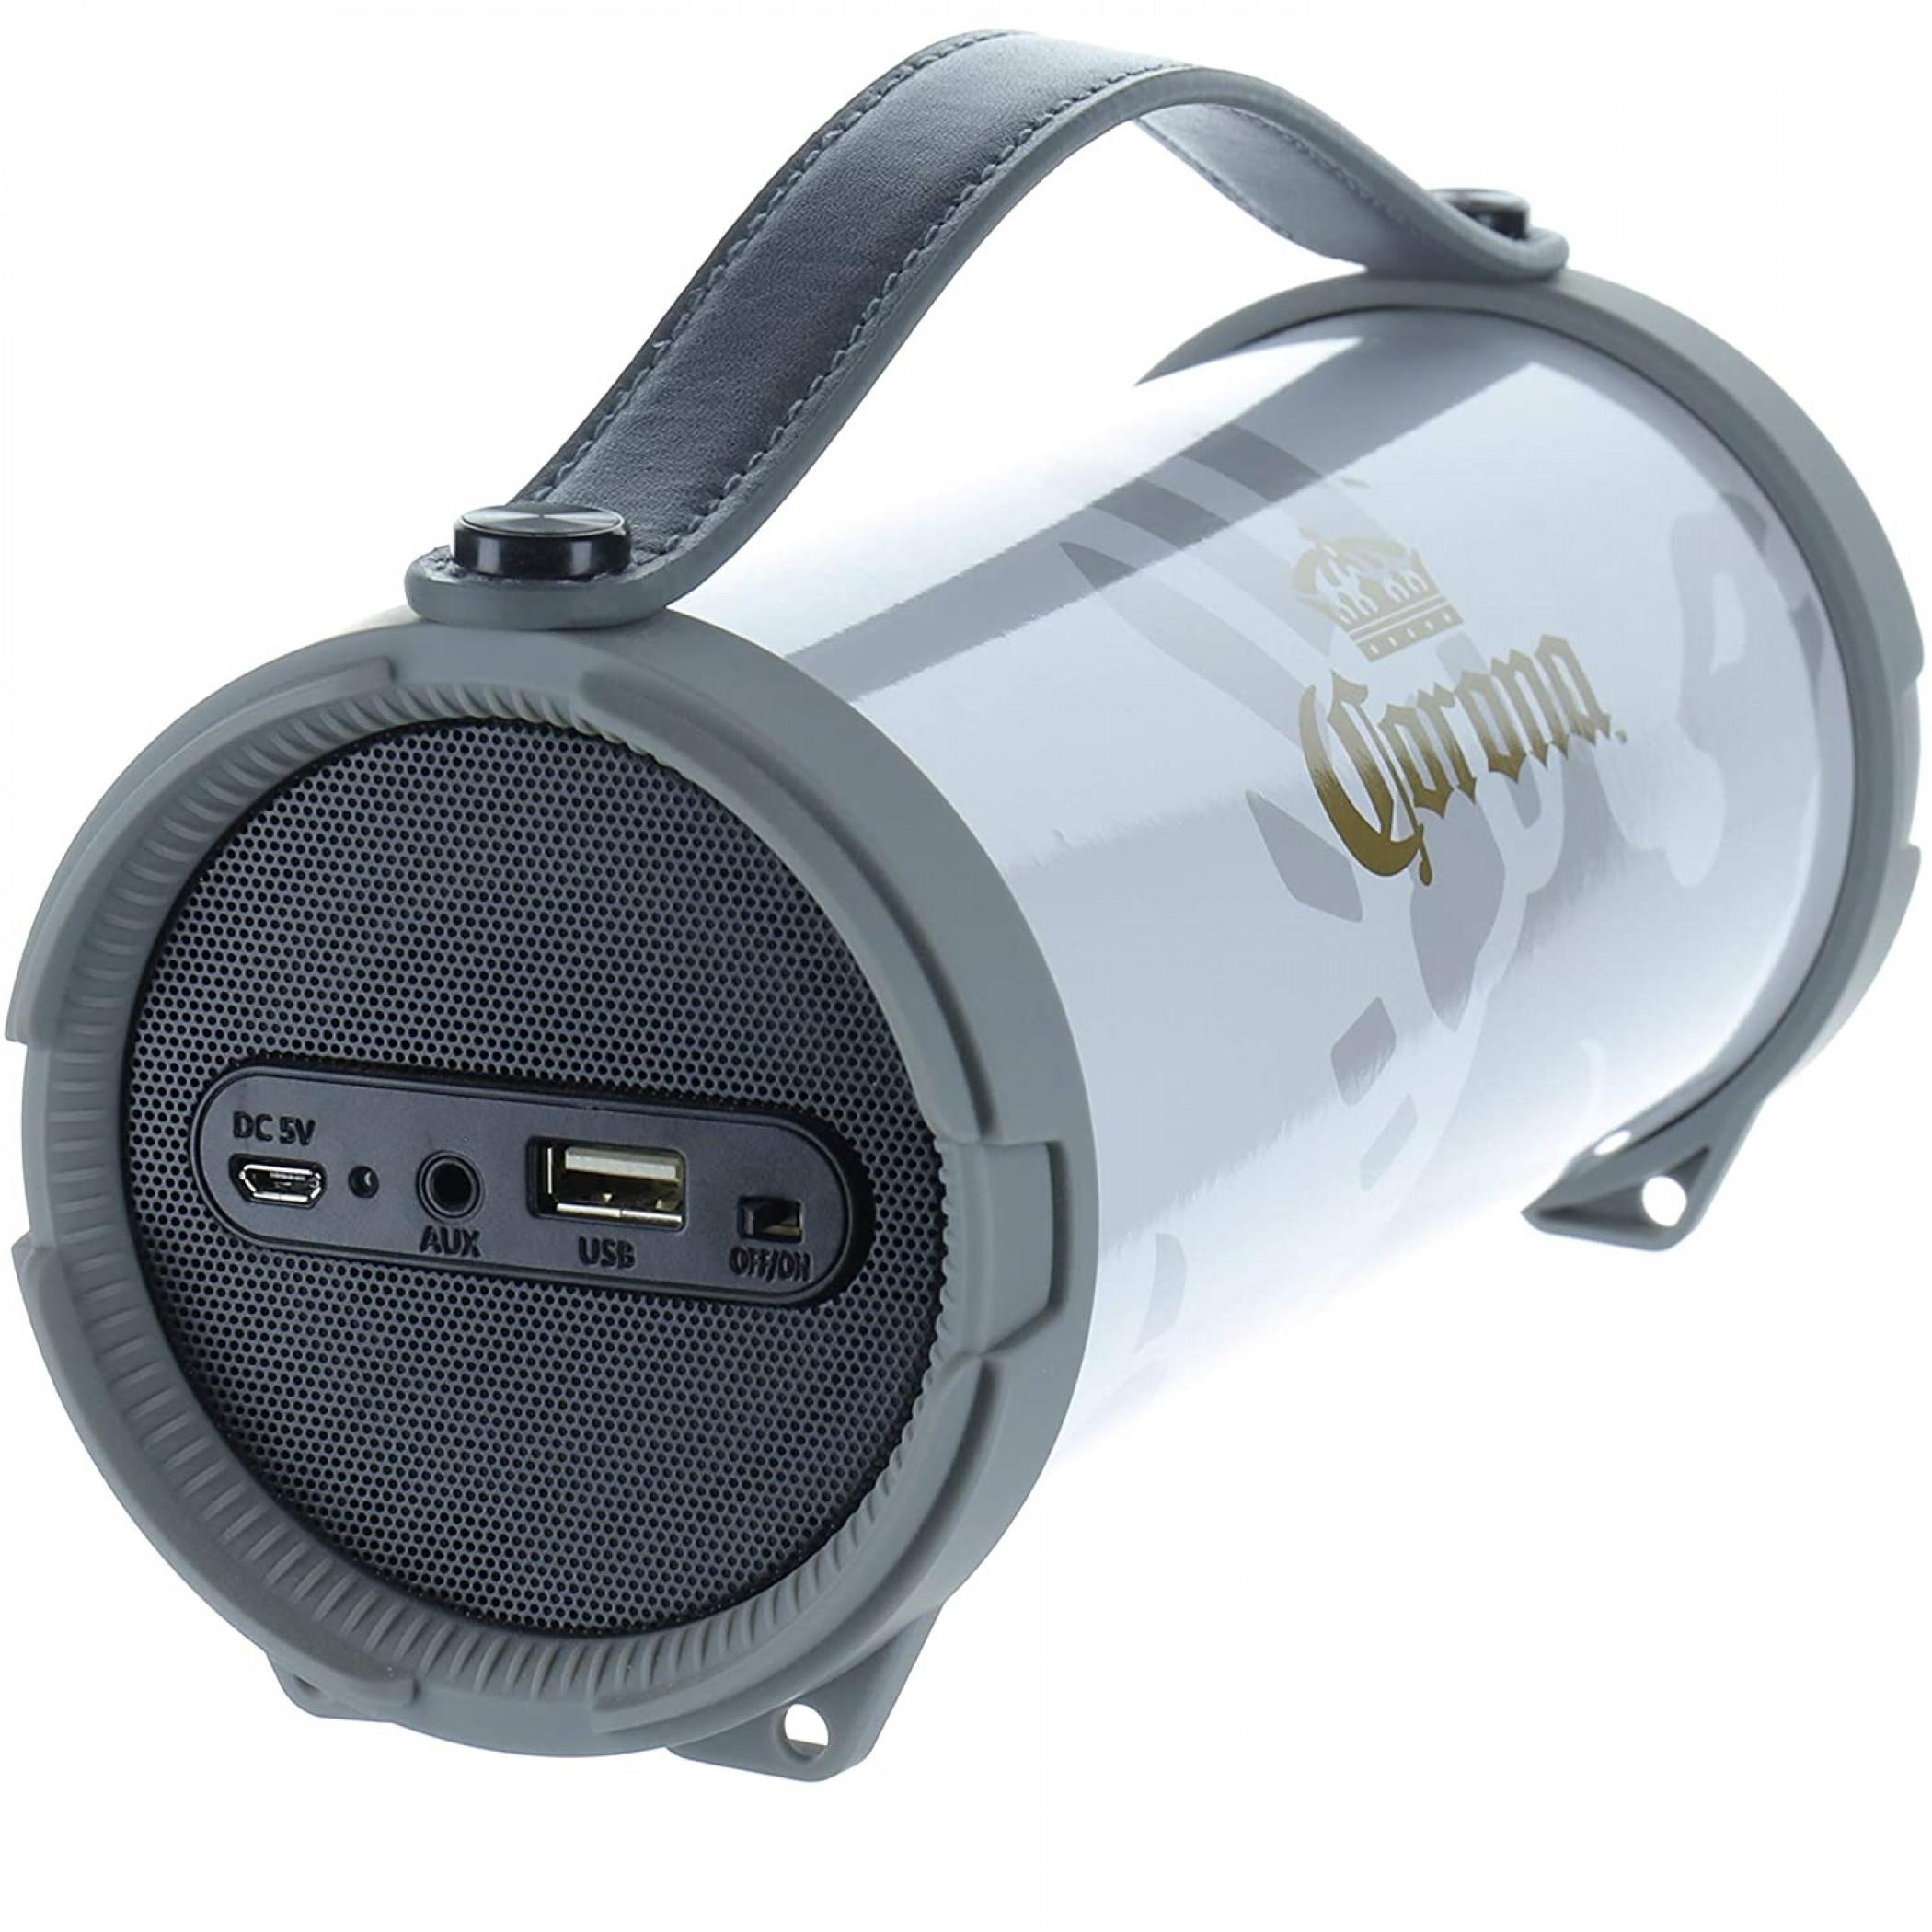 Corona Extra HiFi Portable Wireless Bluetooth Boombox Speakers